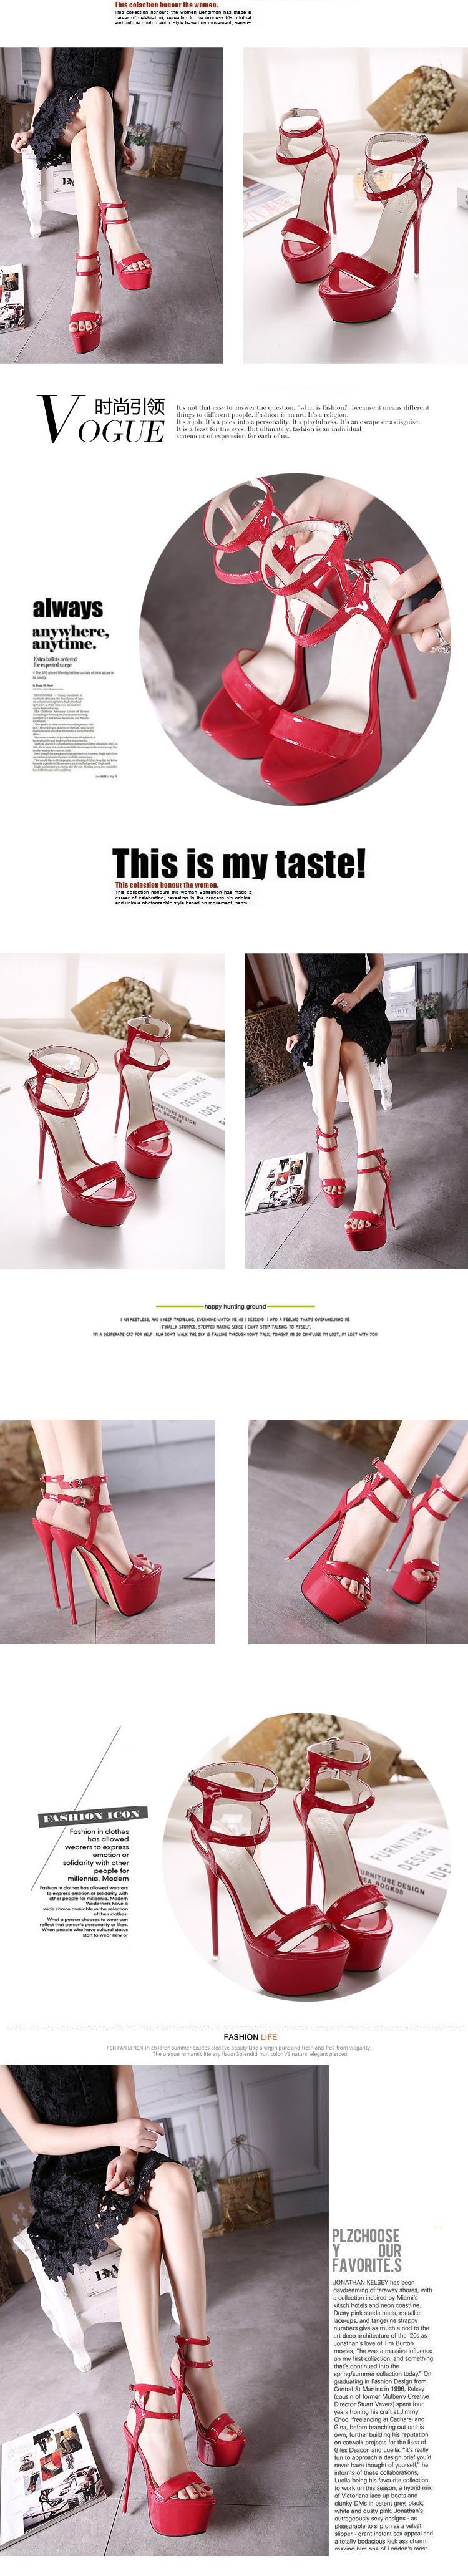 HTB1sMlYLVYqK1RjSZLeq6zXppXaK Women High Heels Sandals 16cm Sexy Stripper Shoes Party Pumps Shoes Women Gladiator Platform Sandals Size 35-46 CWF-my166-2